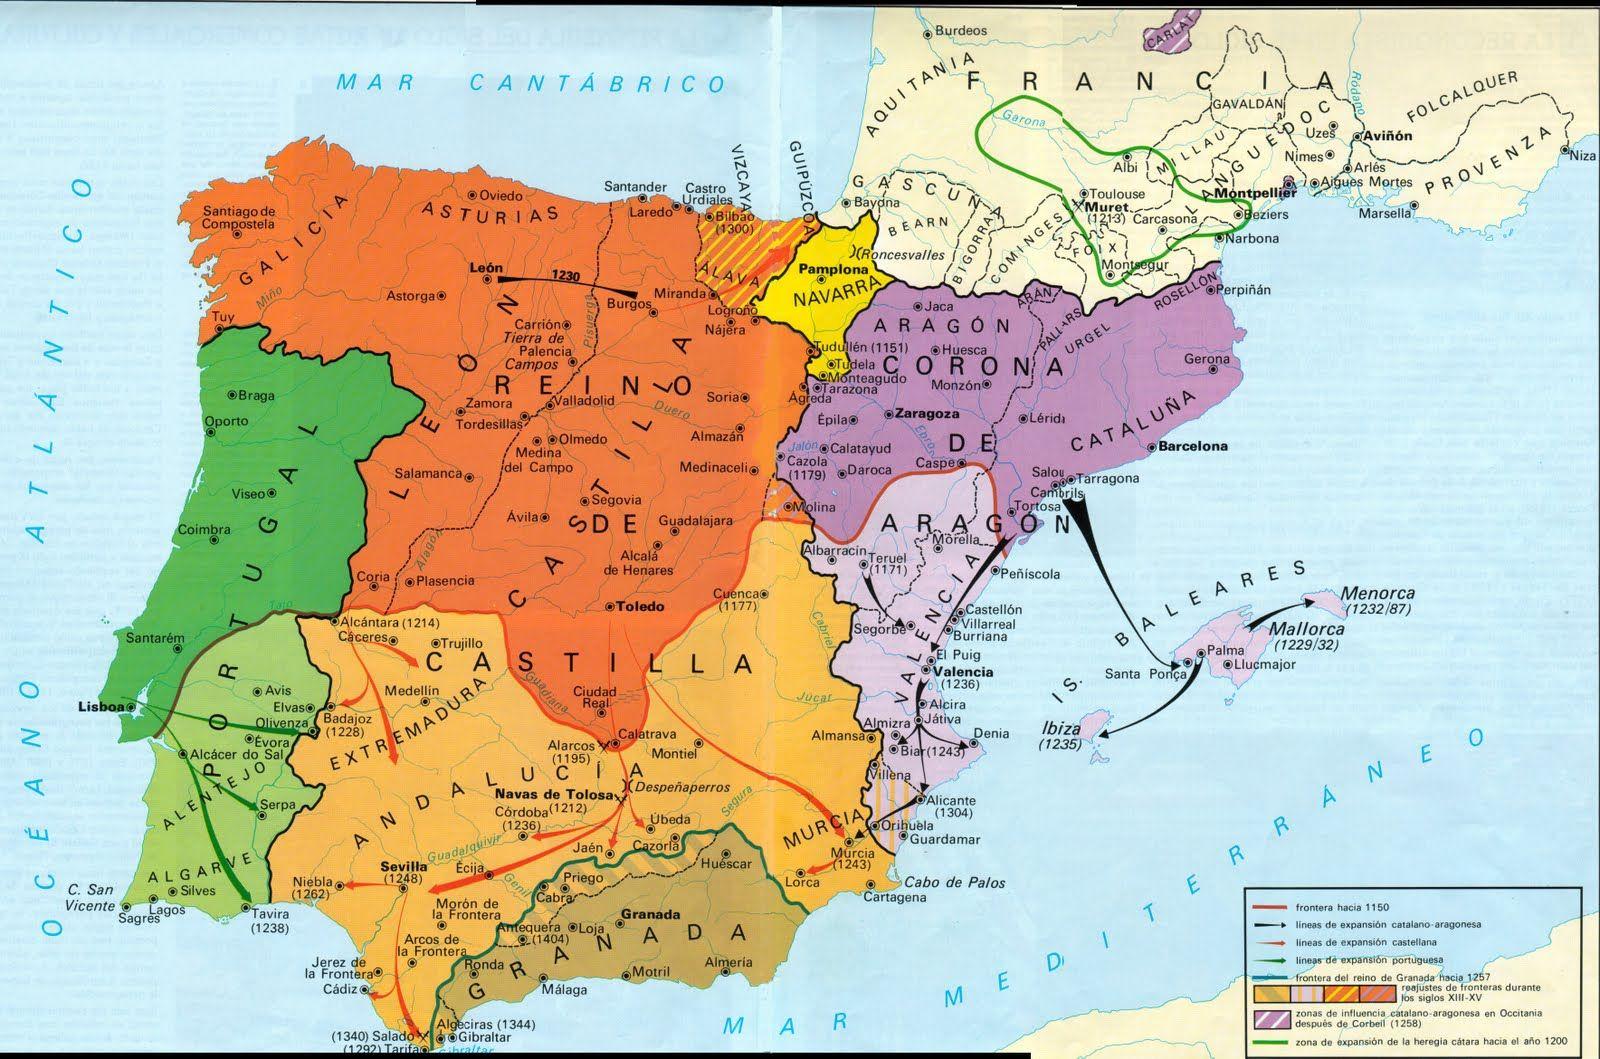 Navas De Tolosa Mapa.La Peninsula Despues De Las Navas De Tolosa Mapa De Espana